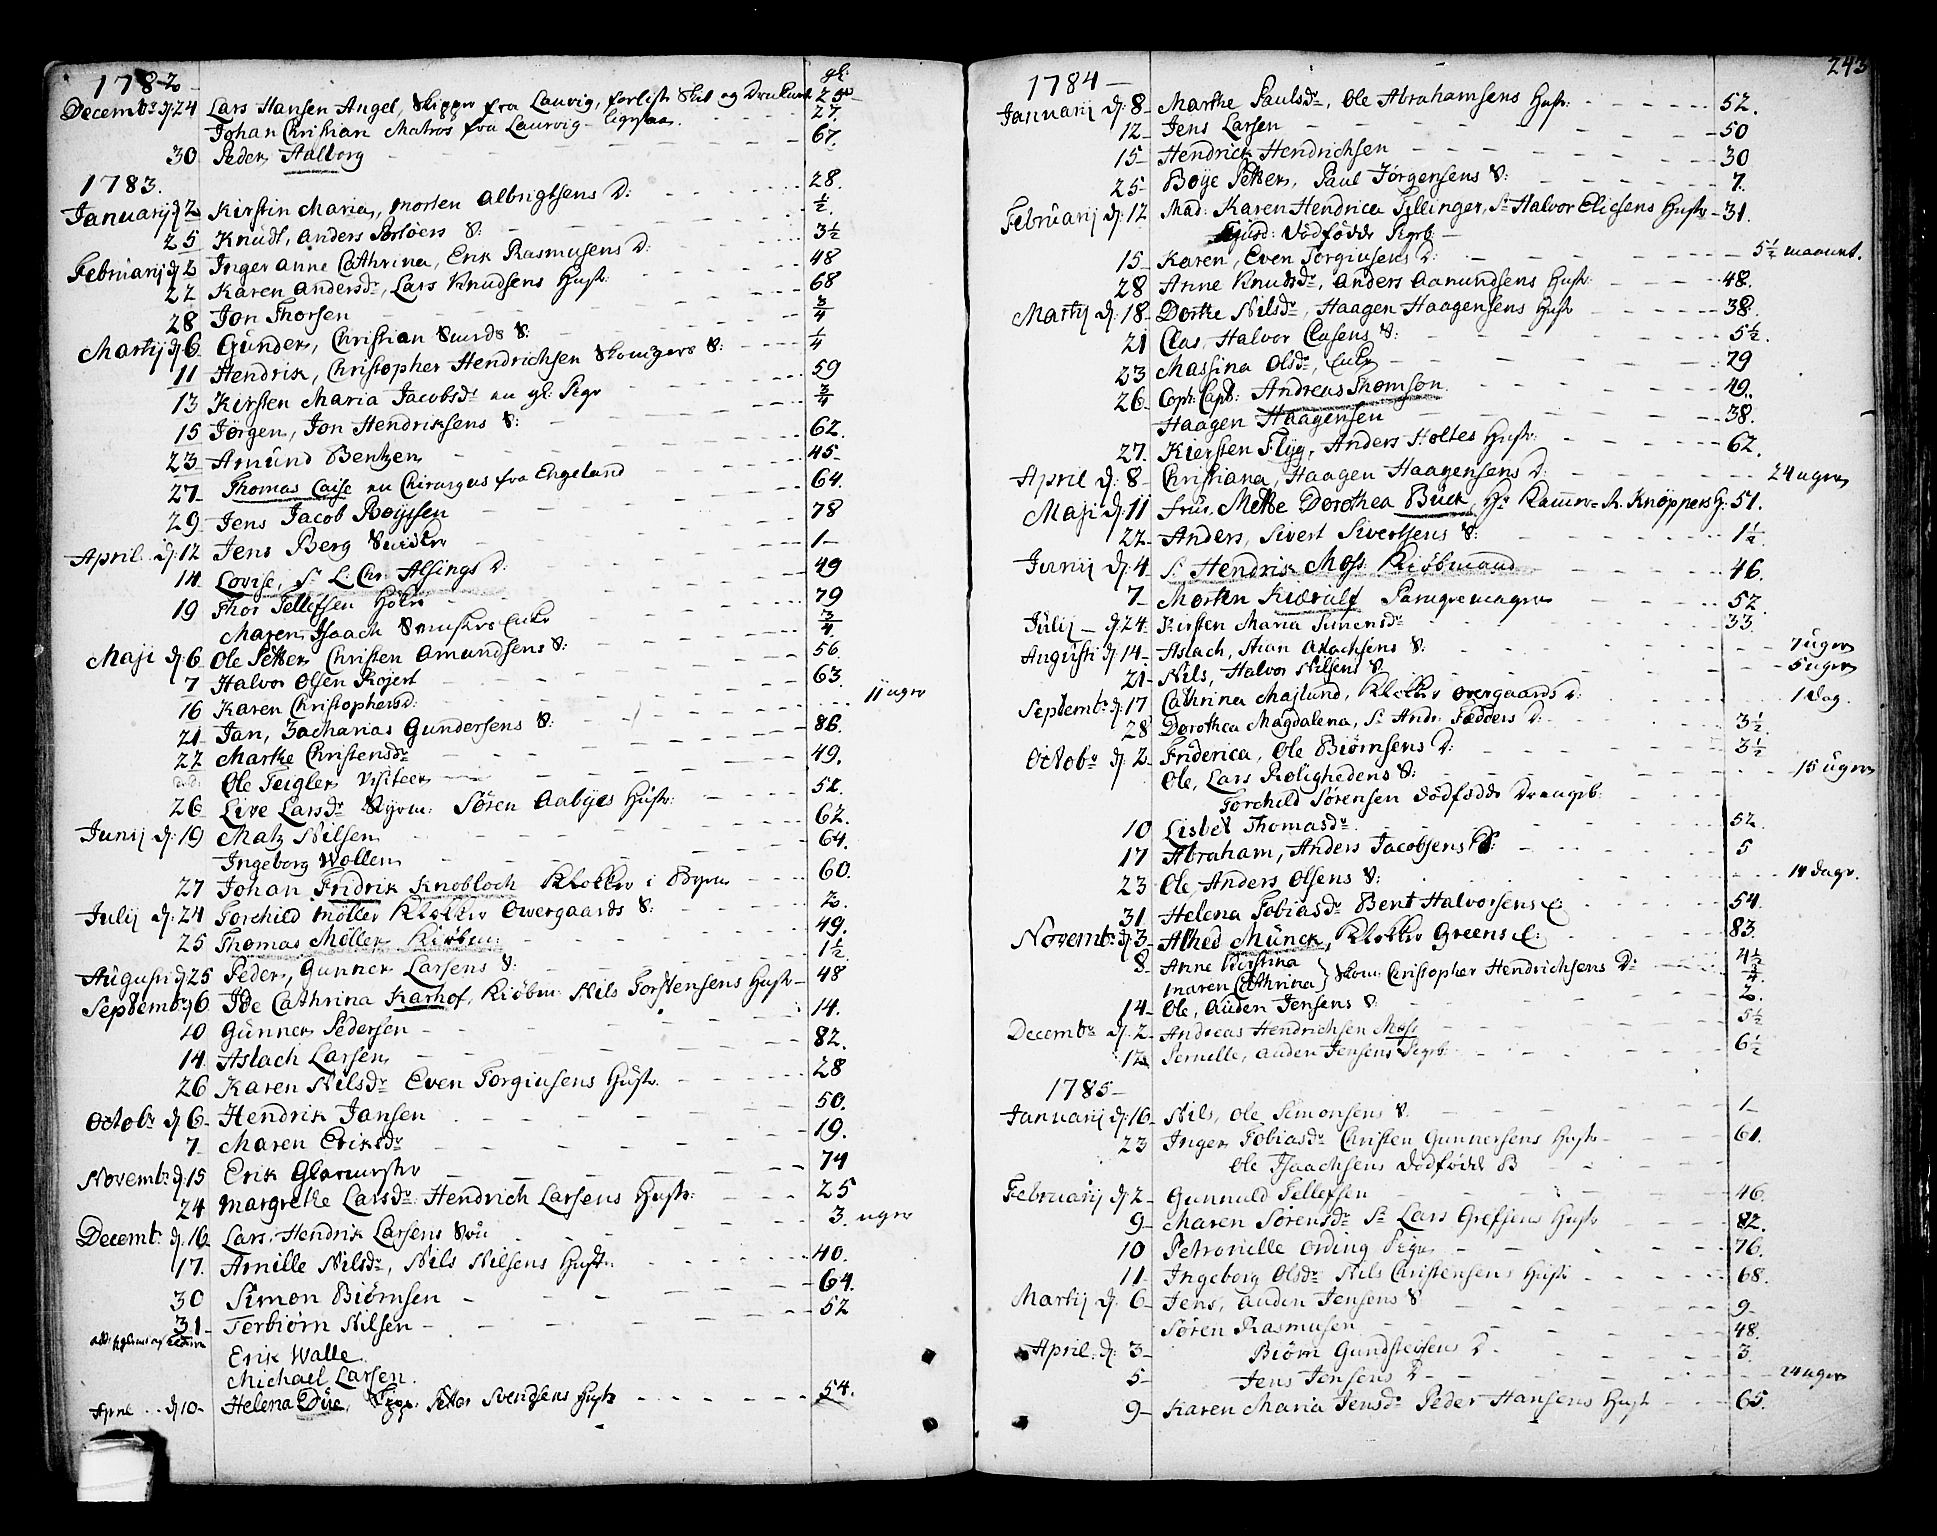 SAKO, Kragerø kirkebøker, F/Fa/L0002: Ministerialbok nr. 2, 1767-1802, s. 243